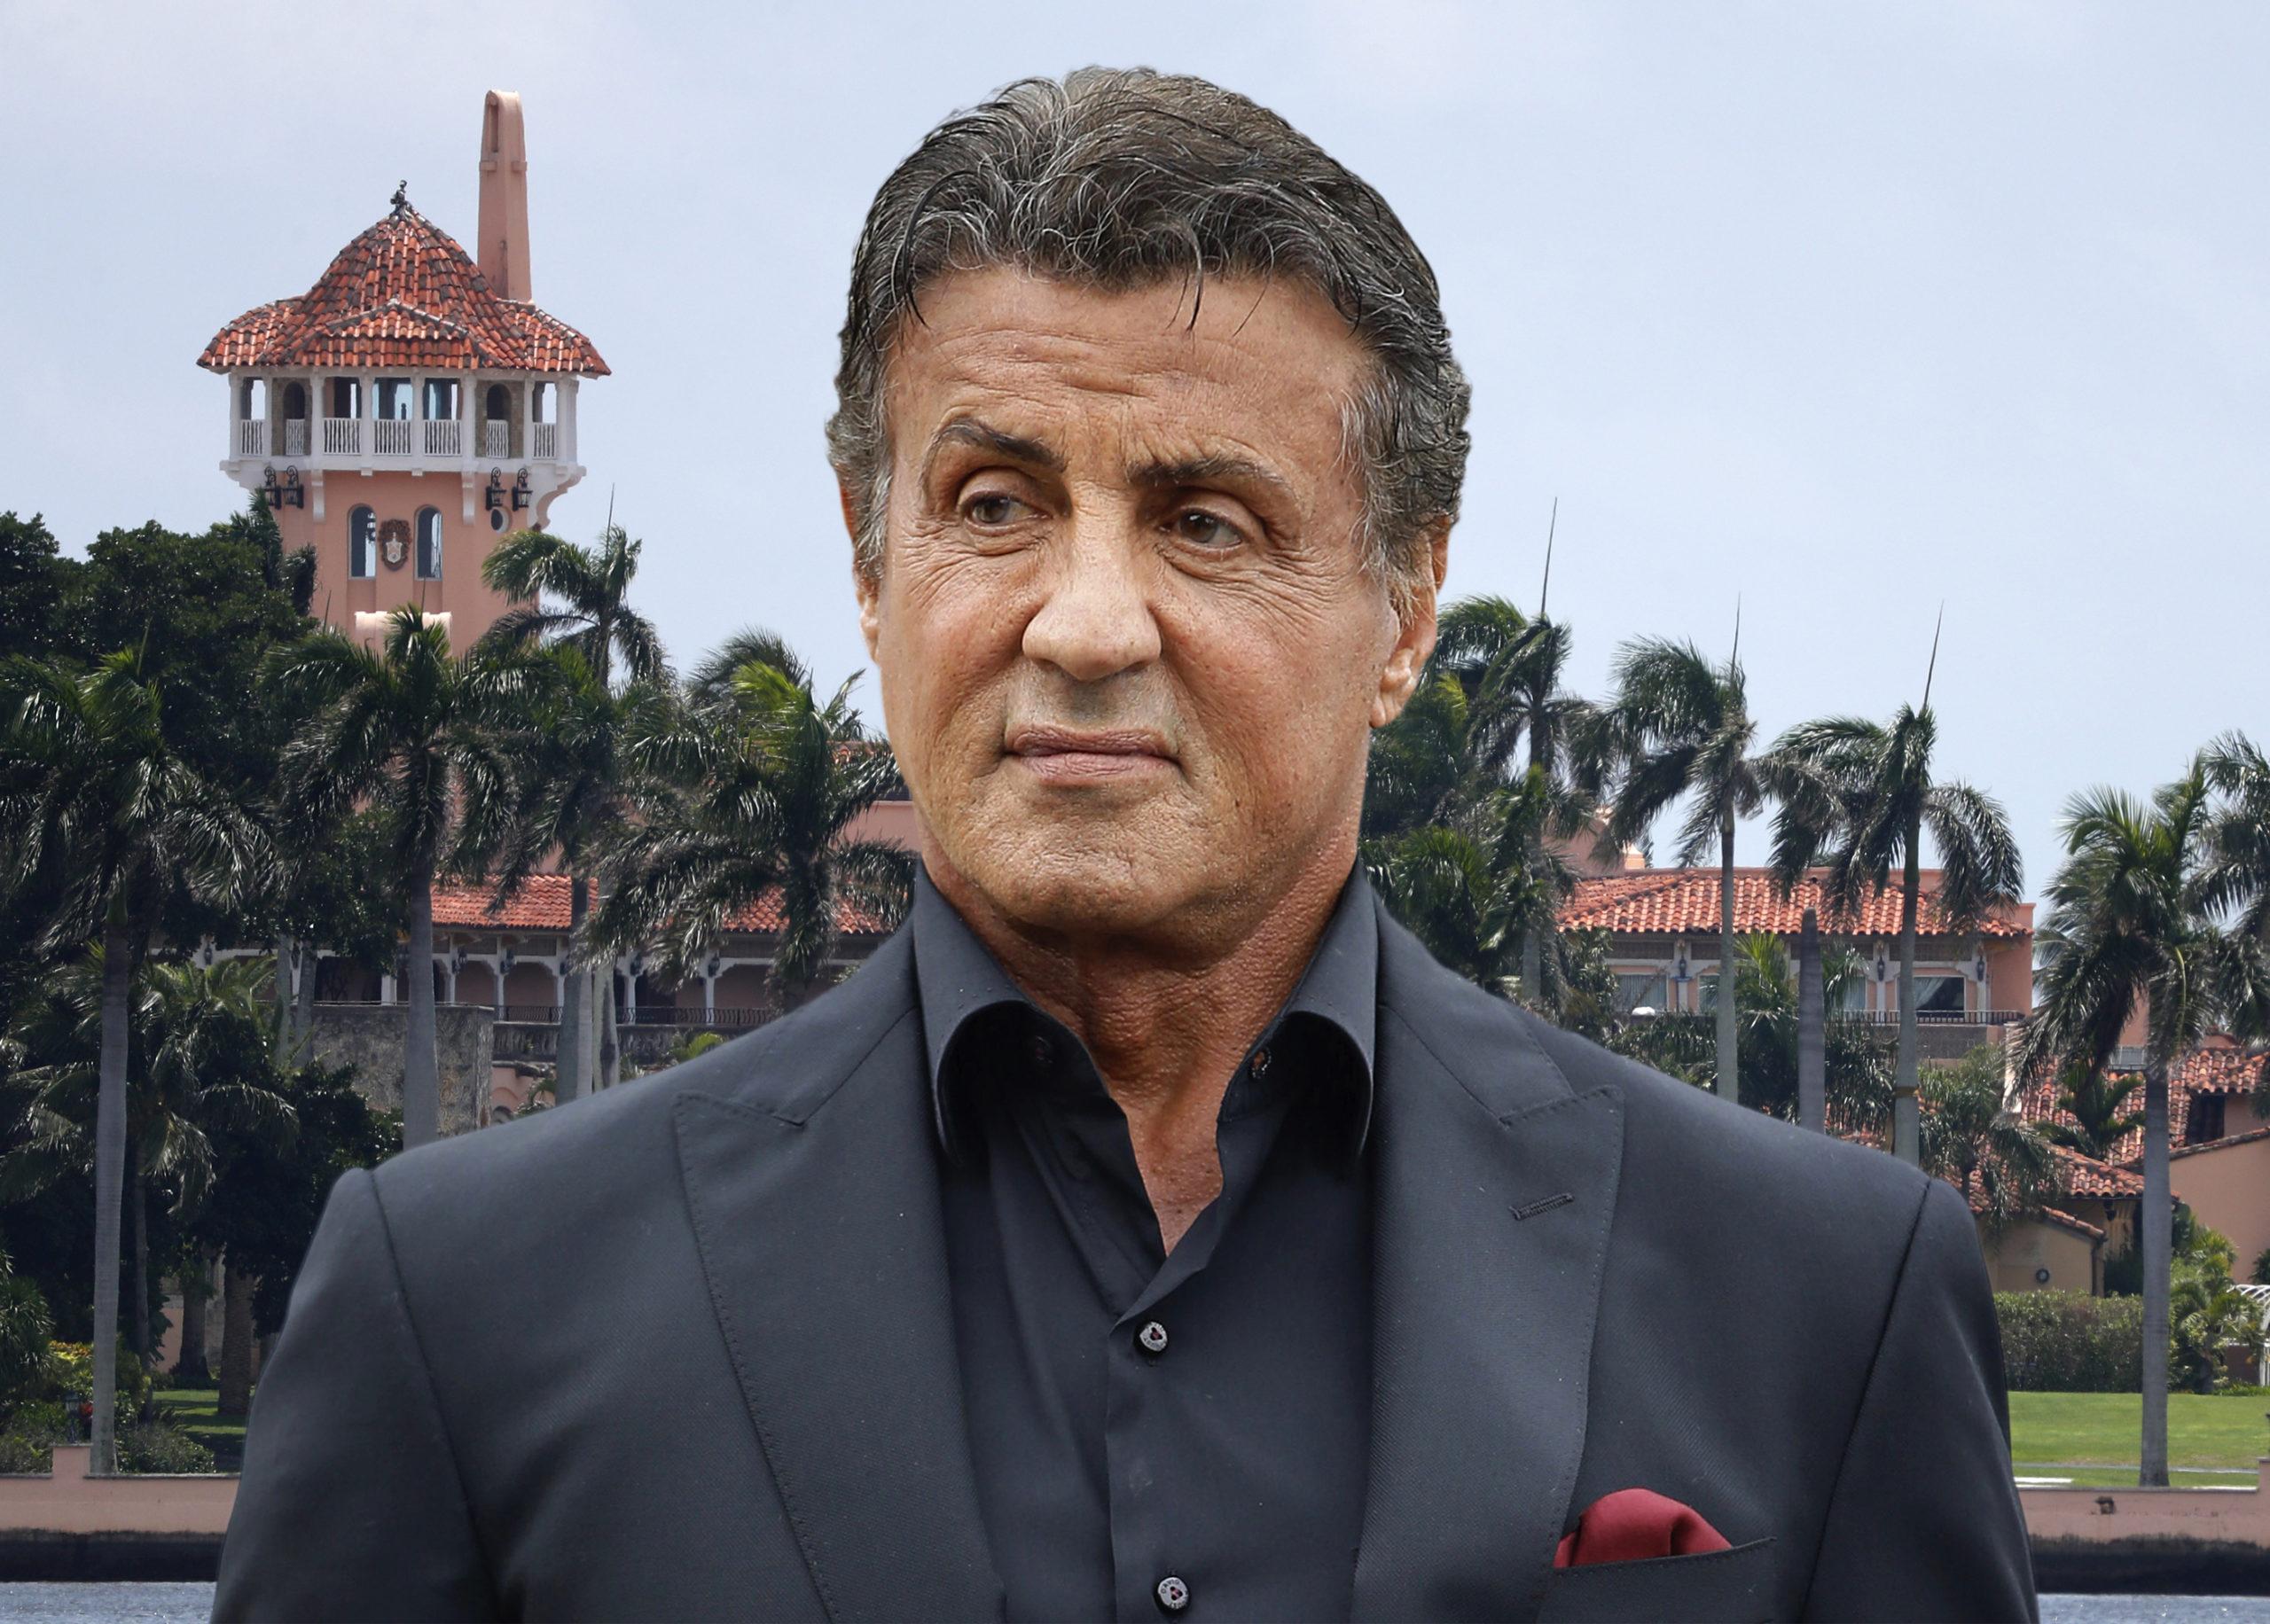 Sylvester Stallone Not A Member Of Mar-a-Lago-LT